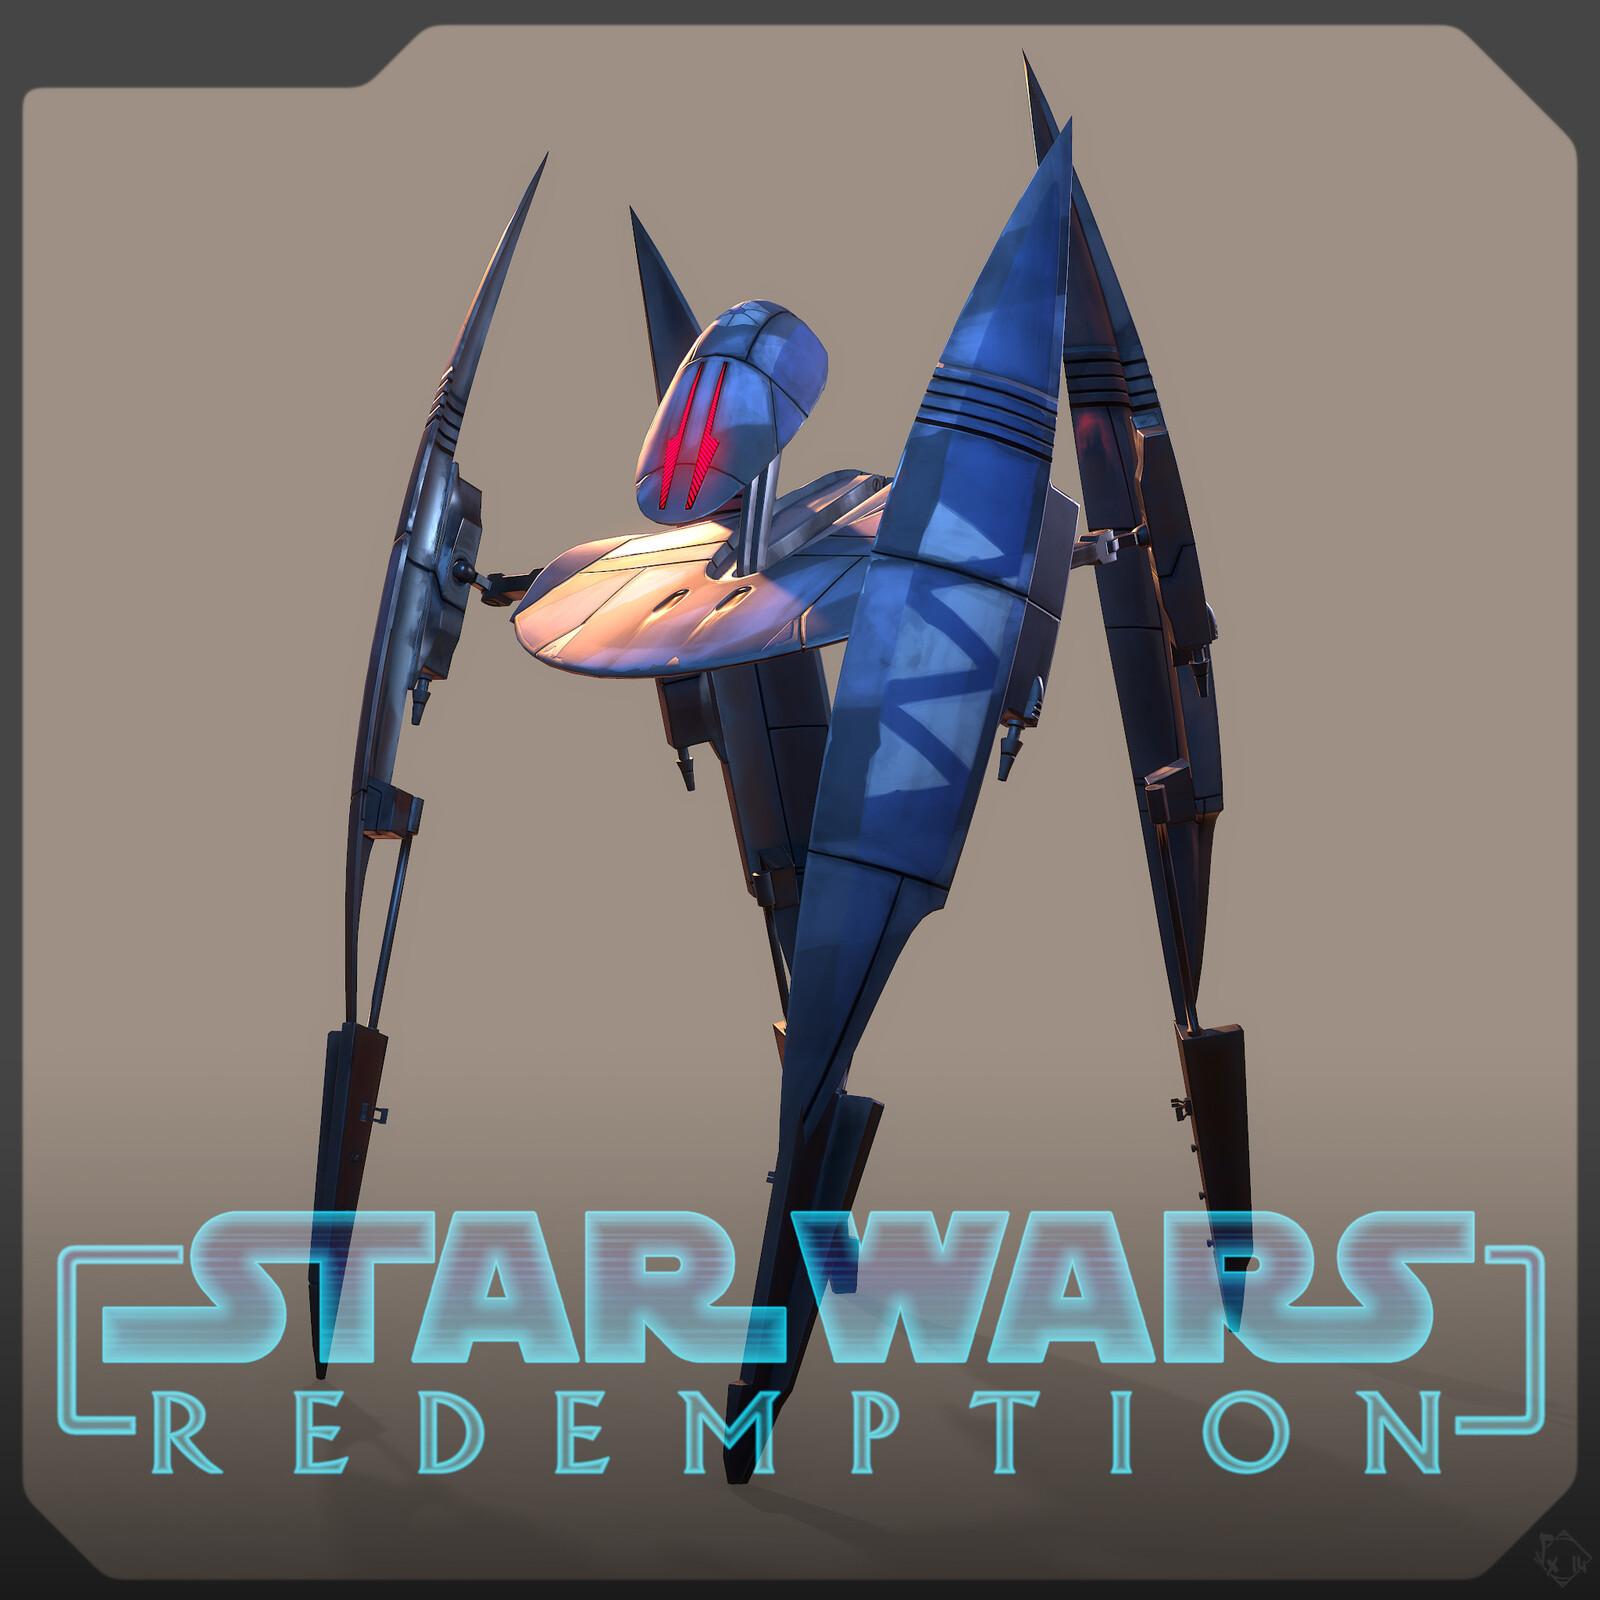 Star Wars - Redemption | CIS Vulture Droid